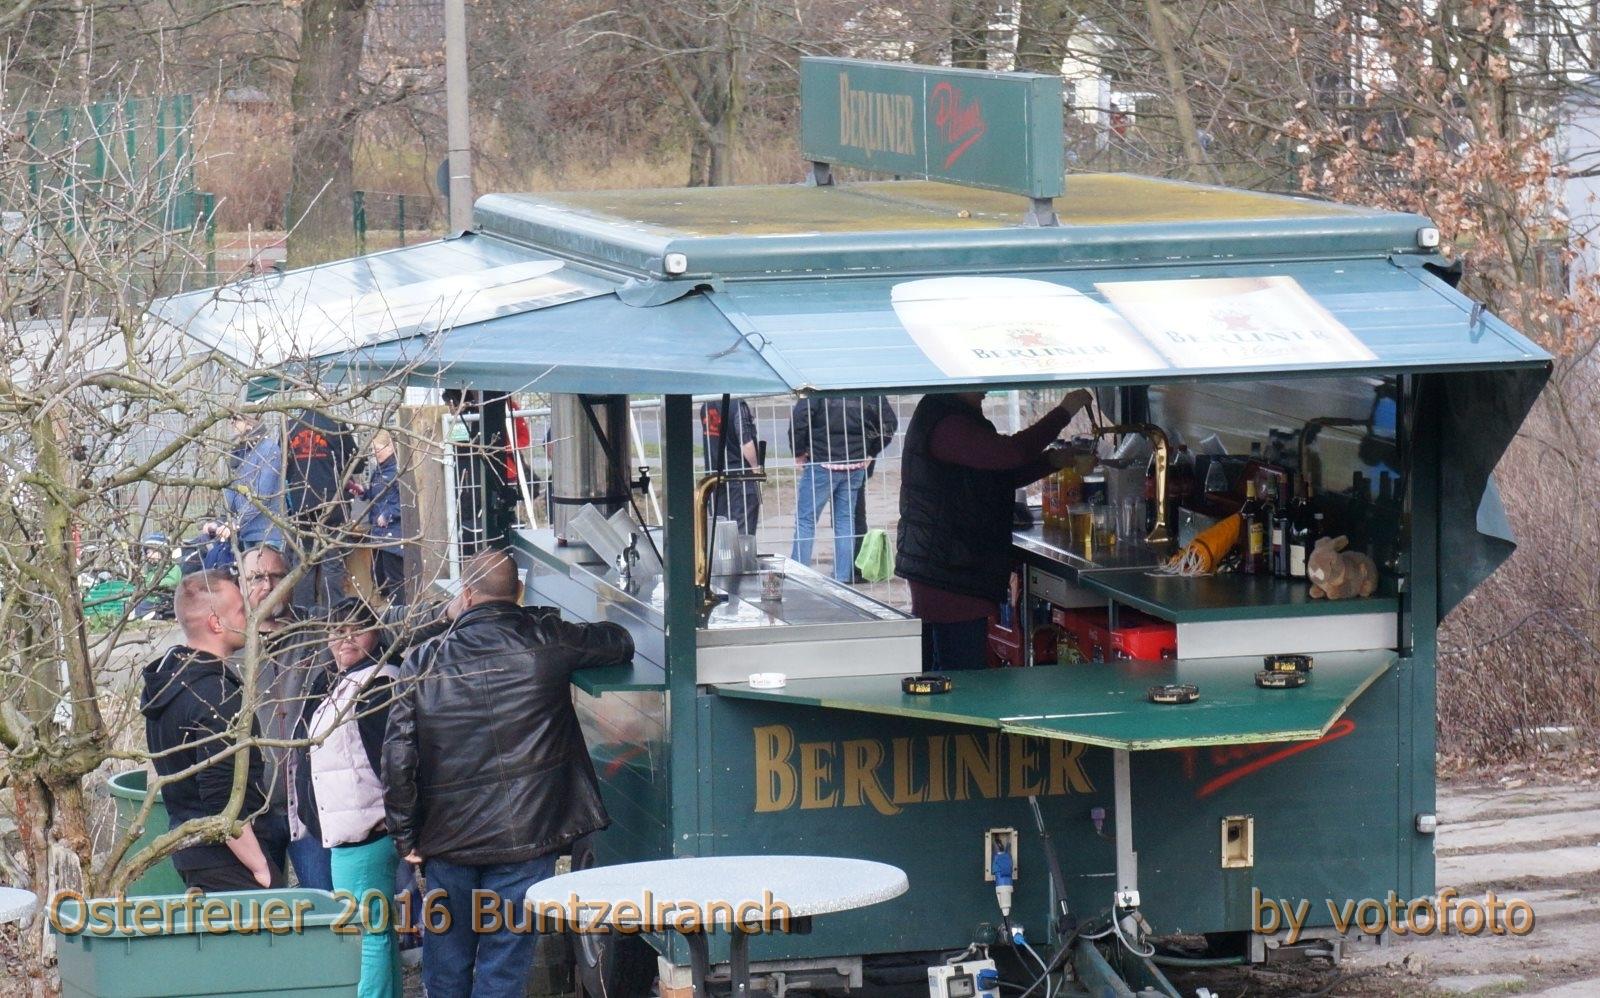 Osterfeuer 2016 Buntzelranch  100